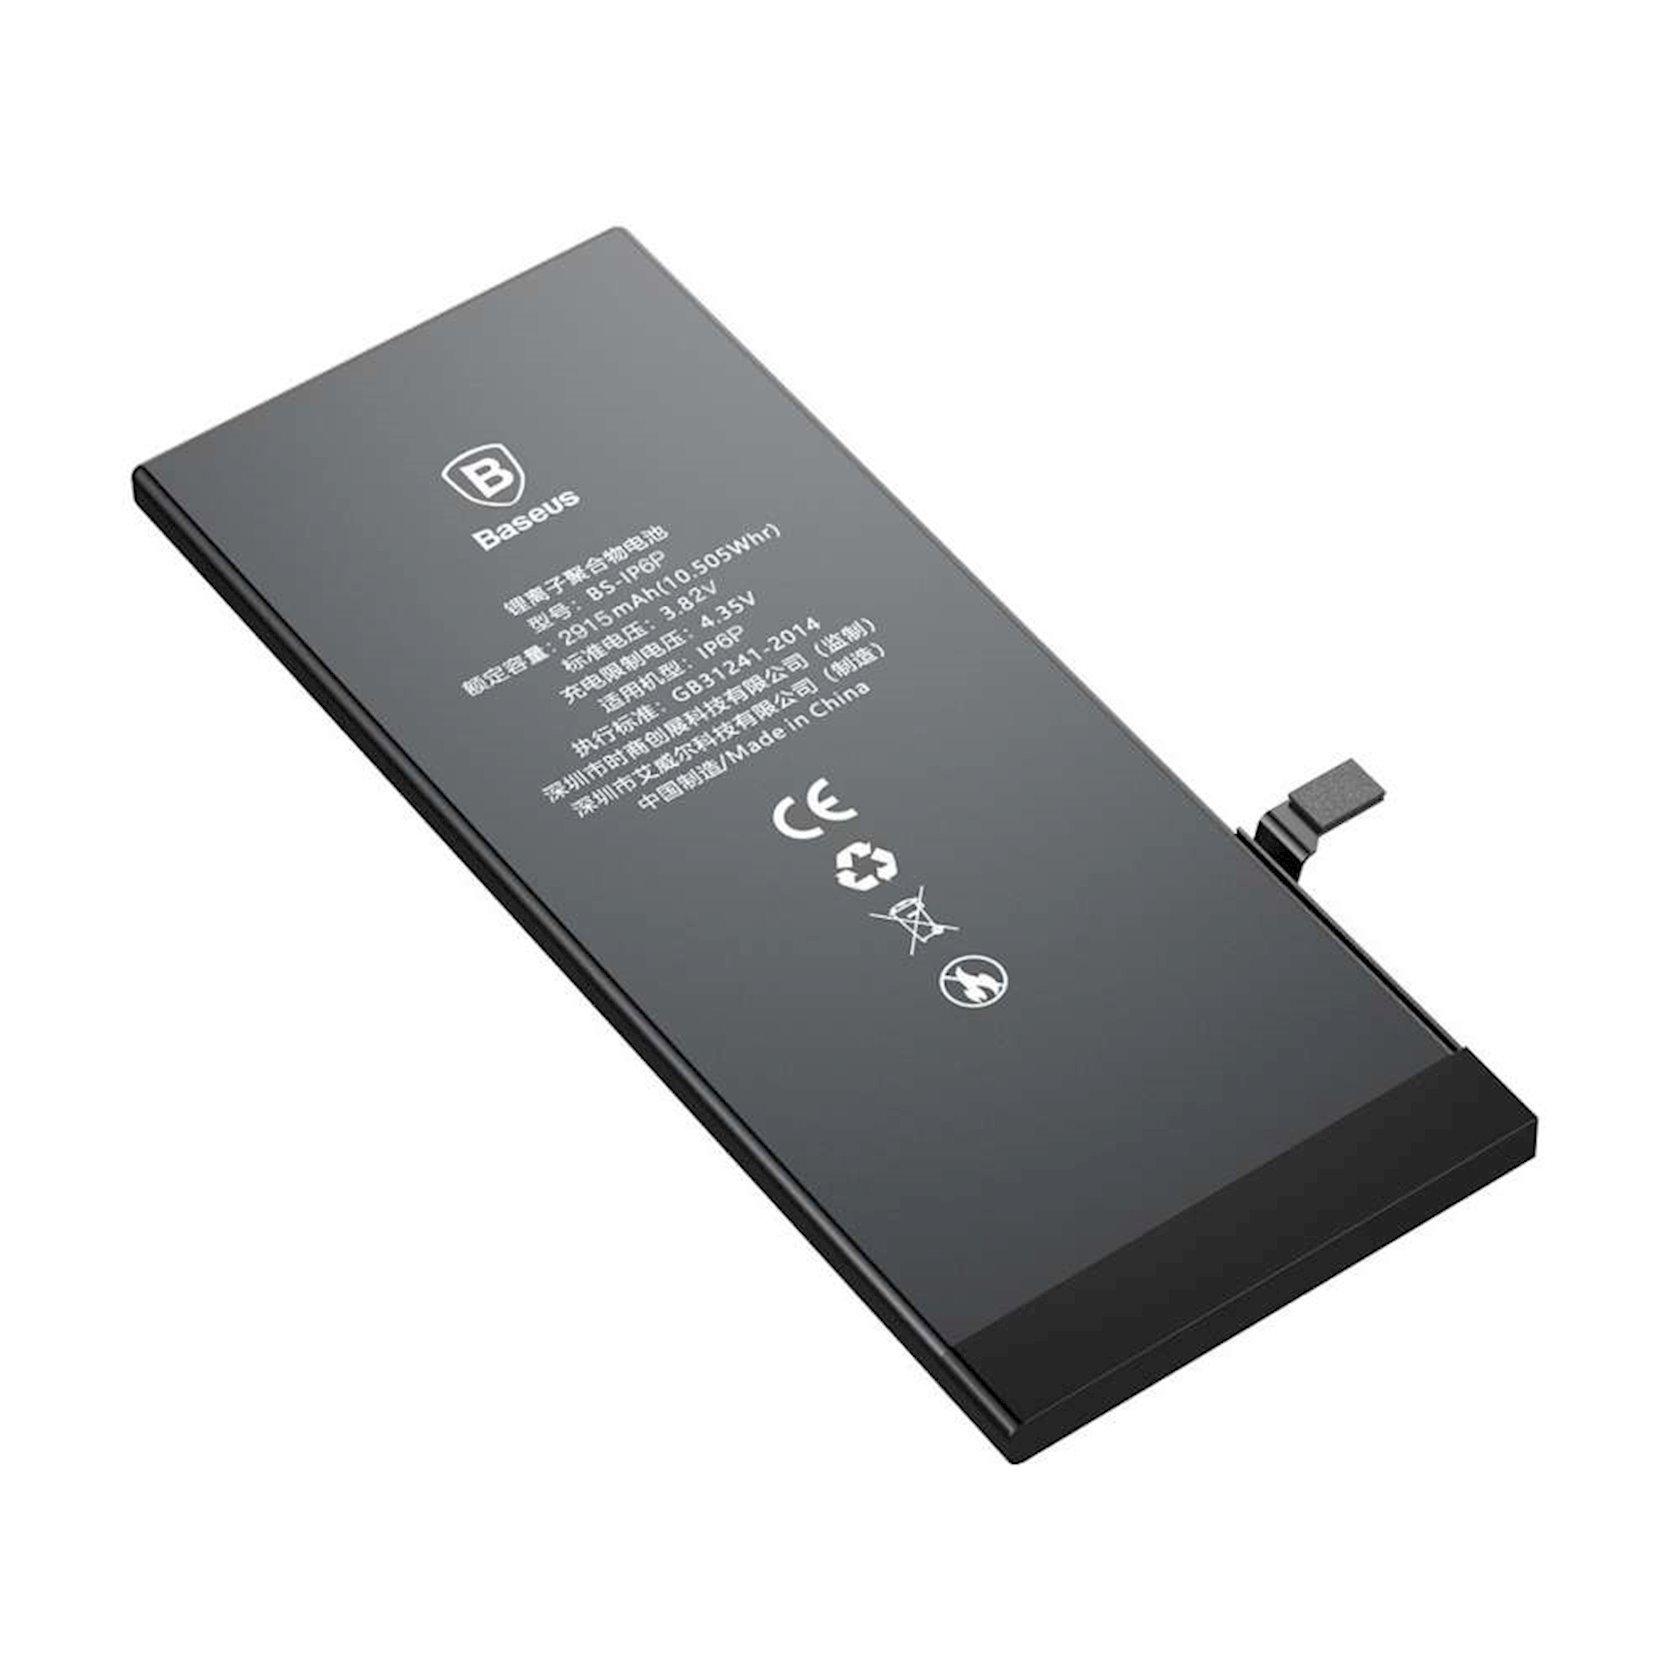 Akkumulyator Baseus Original Phone Battery iphone 6 Plus üçün 2915mAh